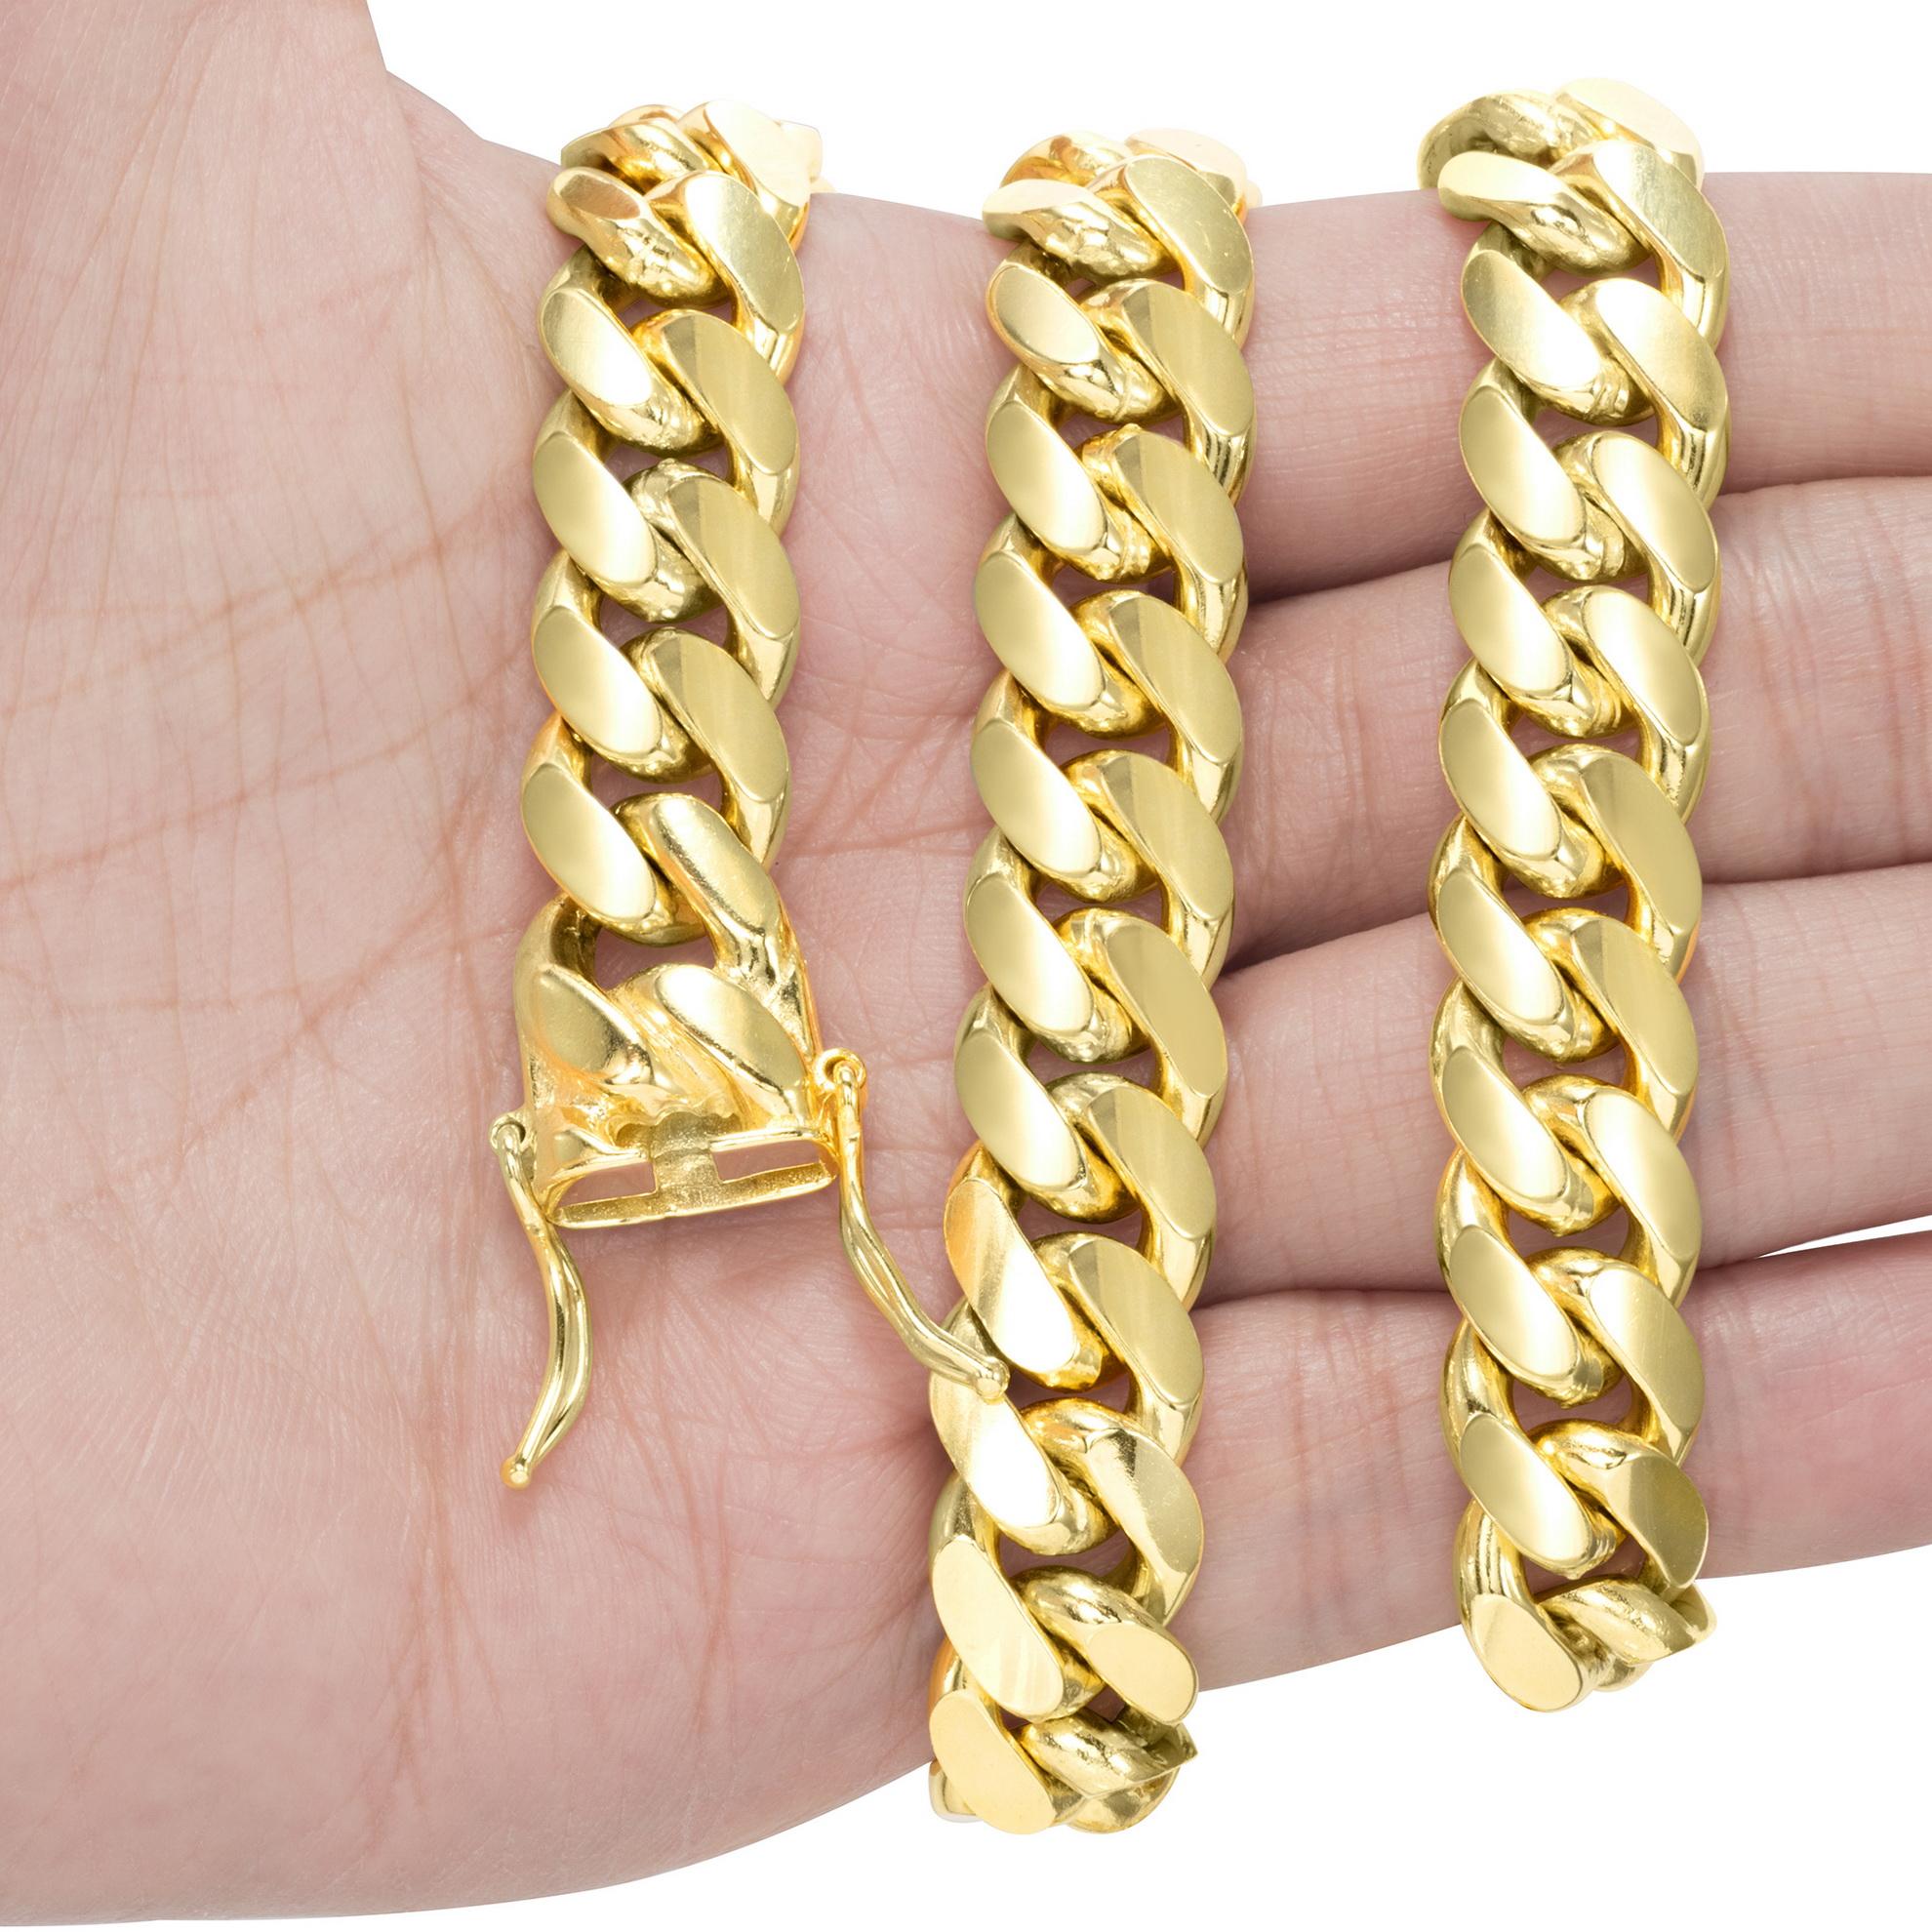 14K-Yellow-Gold-Solid-2-7mm-11mm-Miami-Cuban-Link-Chain-Bracelet-Men-Women-7-034-9-034 thumbnail 11